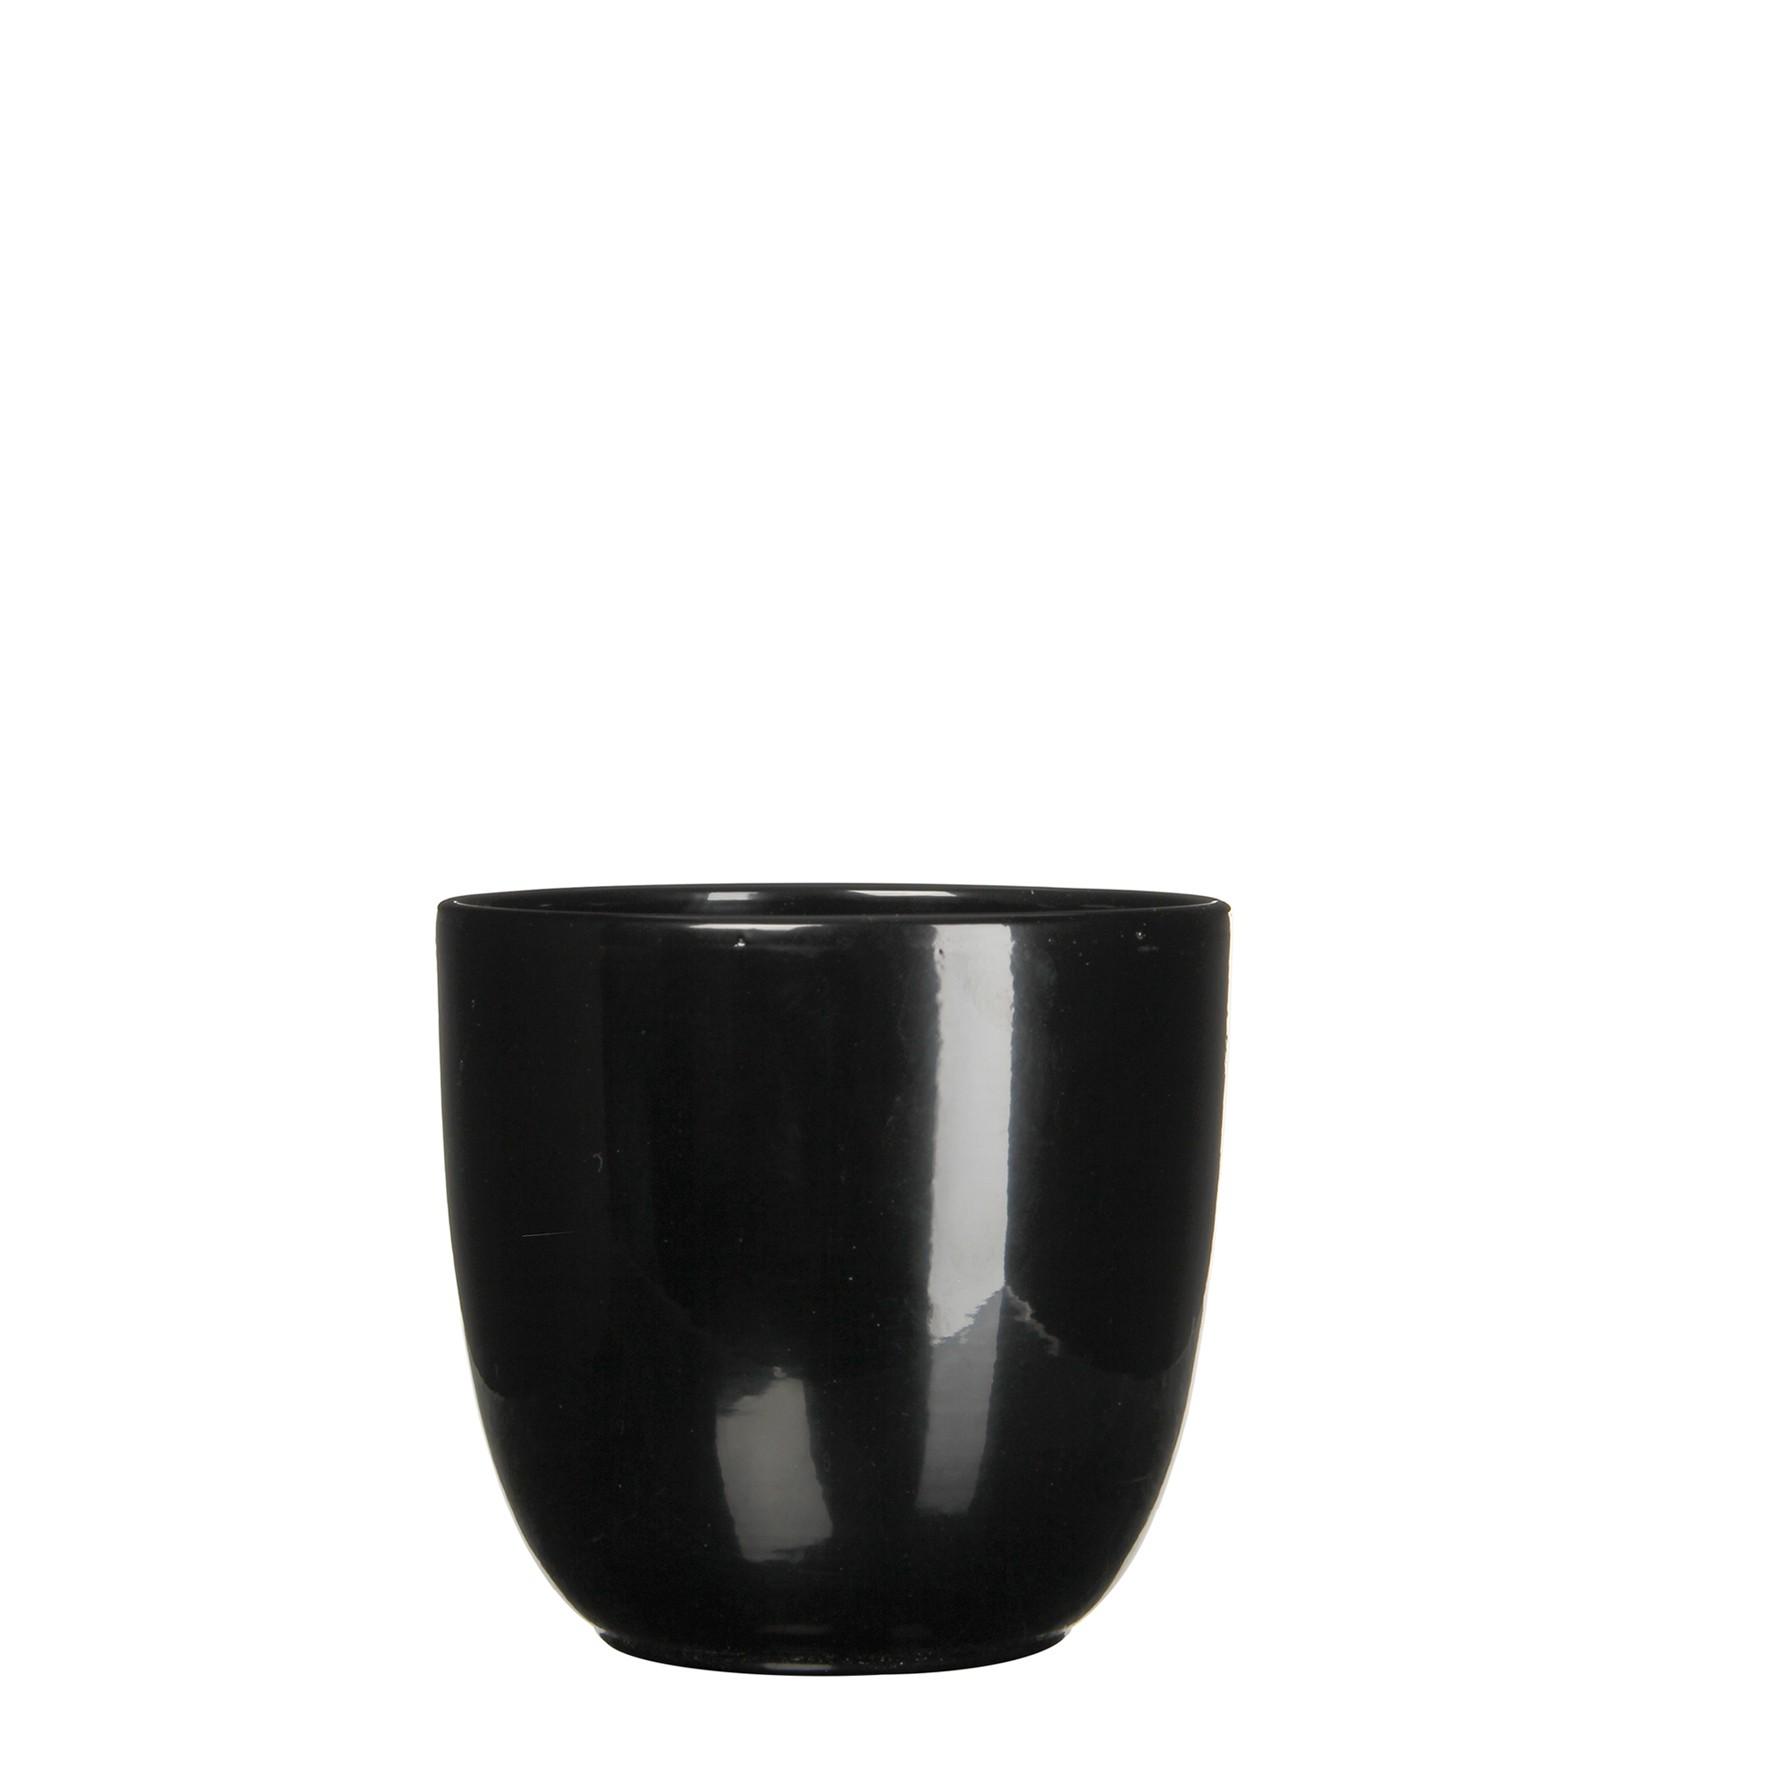 Bloempot Pot rond es/15 tusca 16 x 17 cm zwart Mica